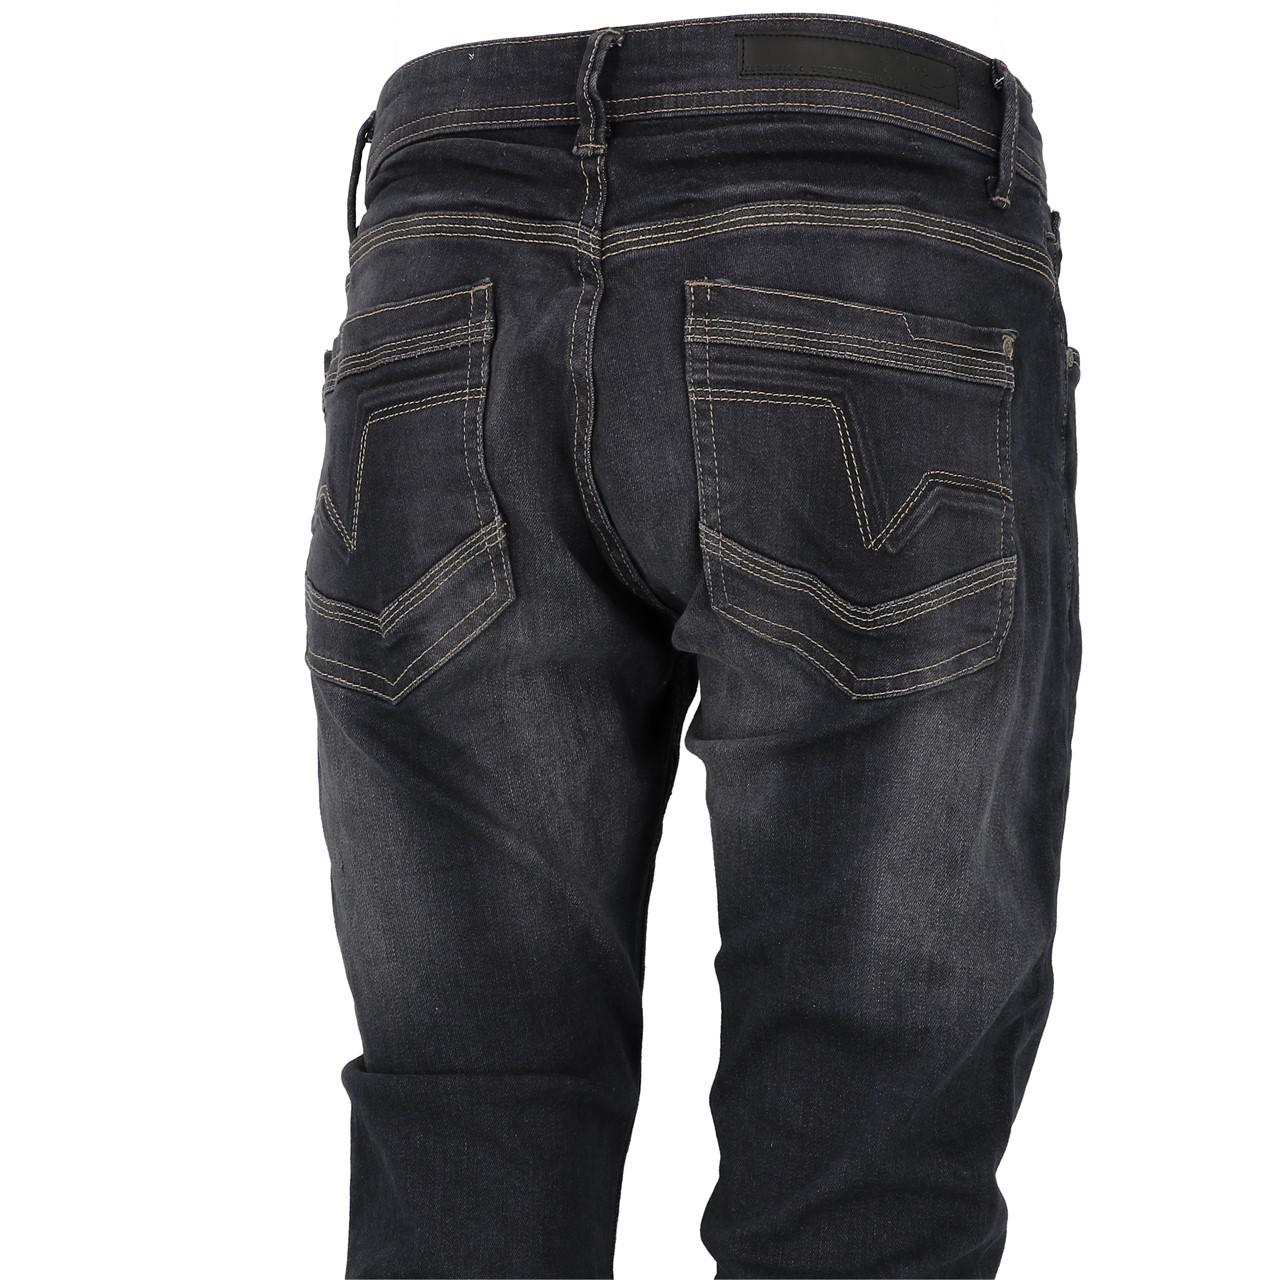 Jeans-Pants-RMS-26-Jeans-Grey-Blue-Regular-Blue-27122-New thumbnail 4